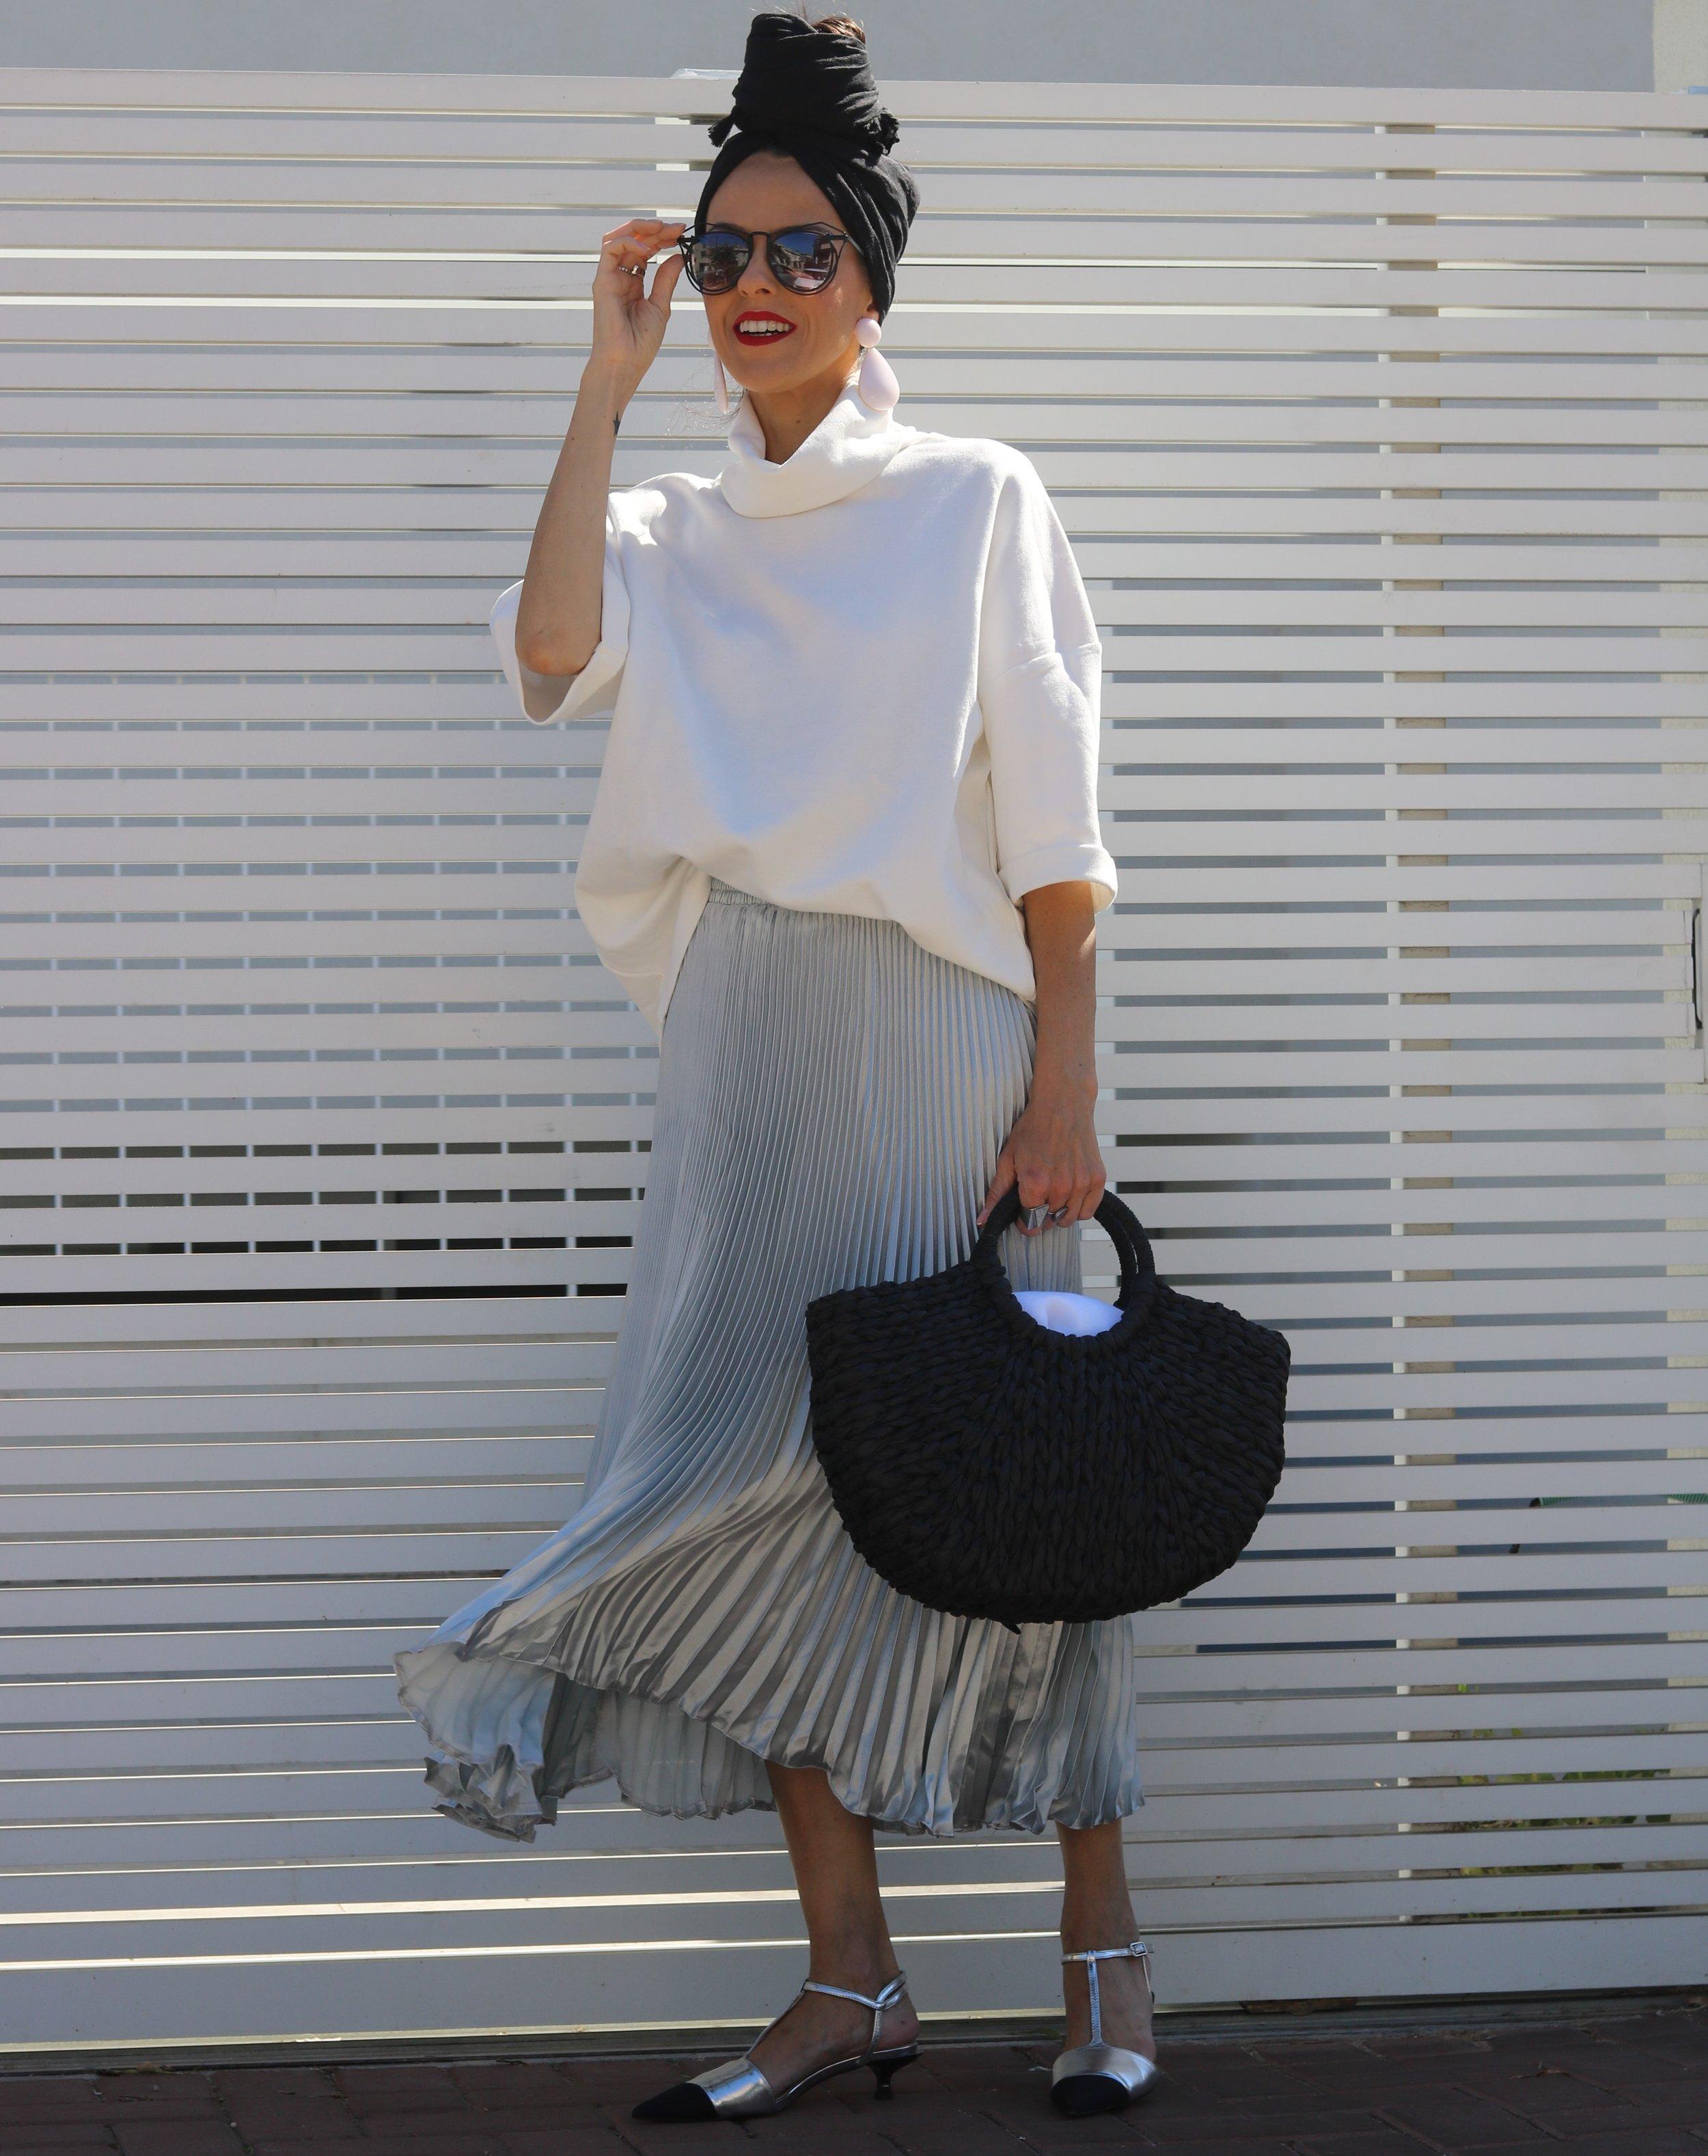 Top, Zara, Skirt, AliExpress, Shoes and Bag, both Zara, Sunglasses, Meirav's one, Earrings, Zara